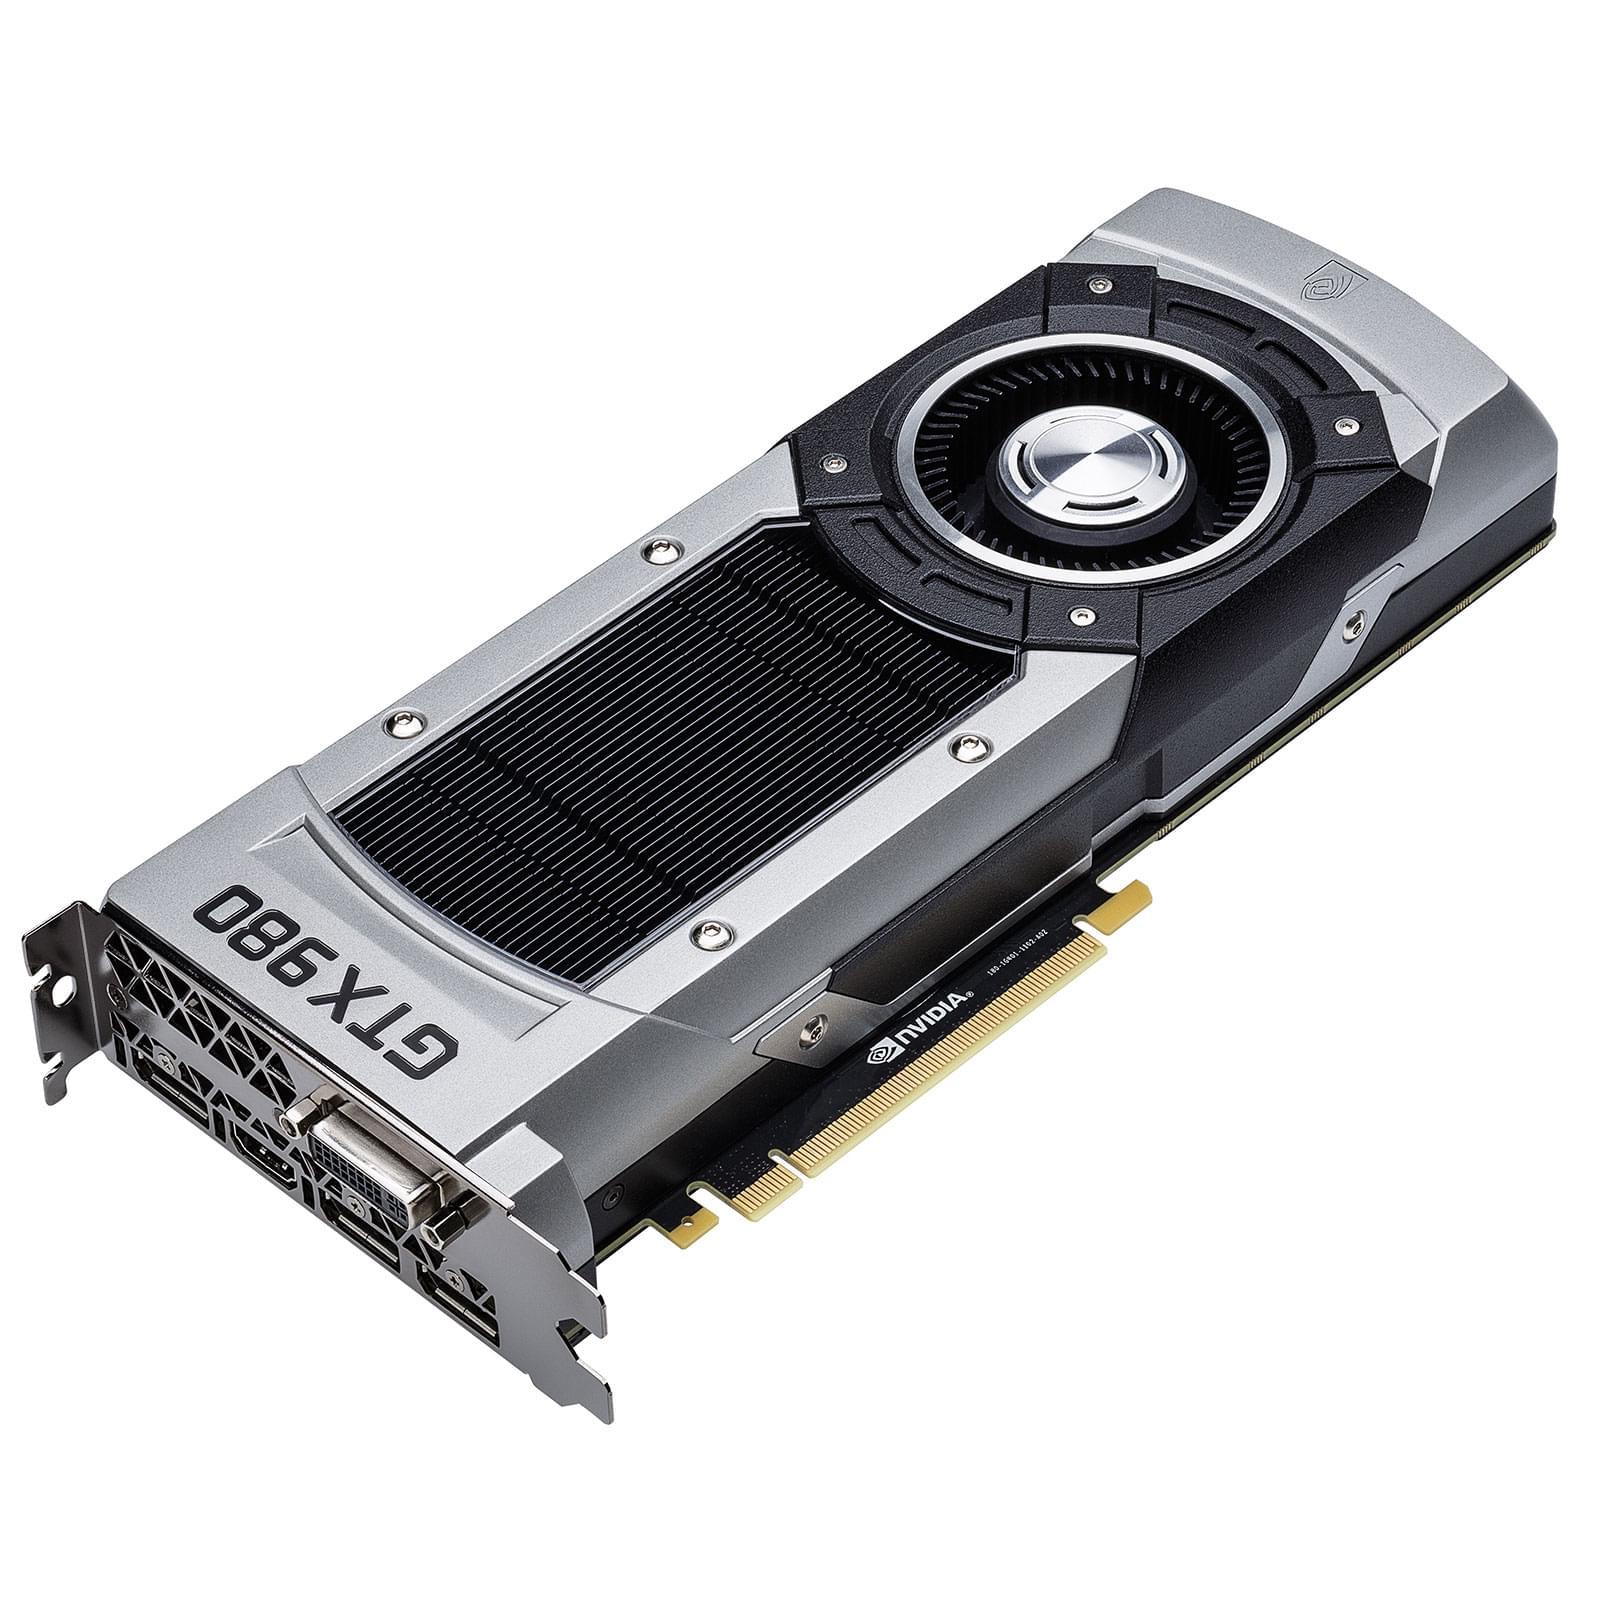 Gigabyte GeForce N980D5-4GD-B  (N980D5 4GD-B obso) - Achat / Vente Carte Graphique sur Cybertek.fr - 0